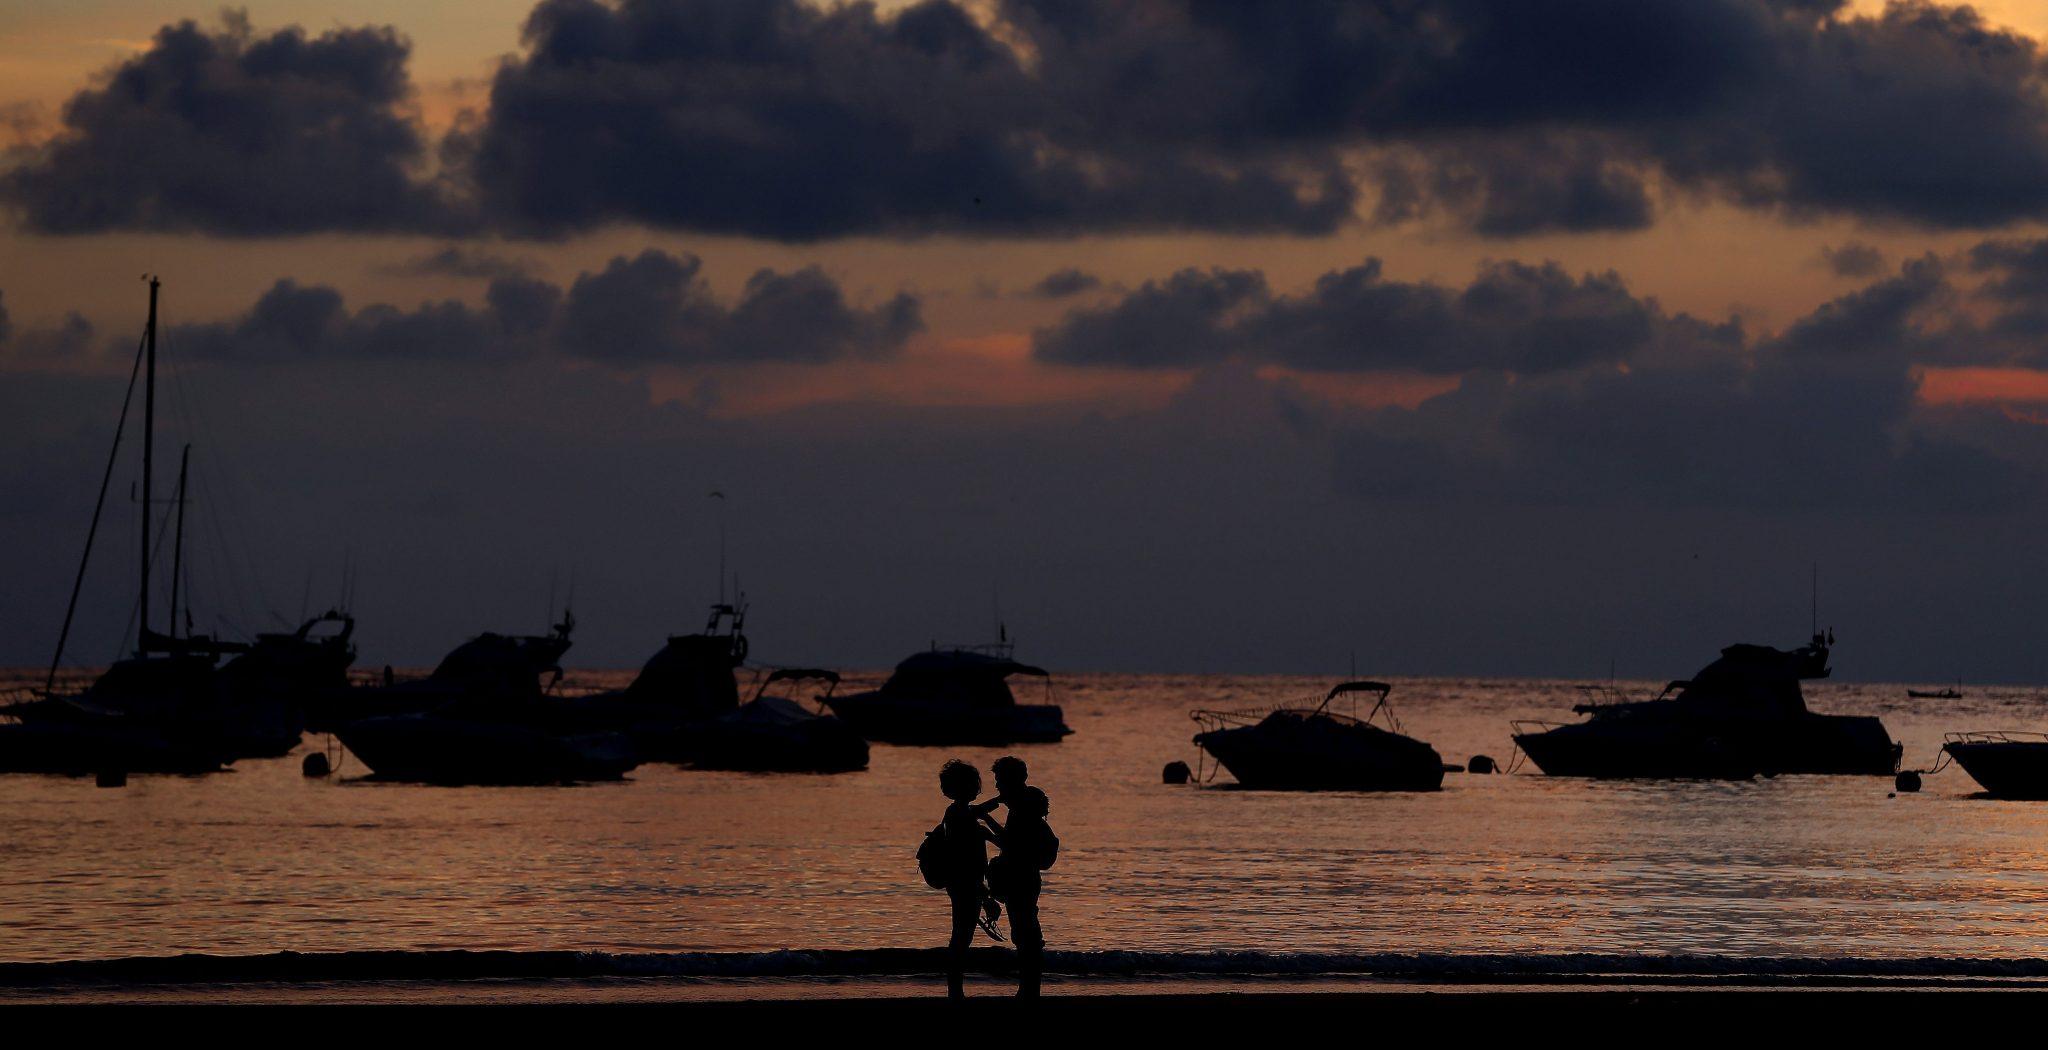 pareja hombre y mujer, anochecer playa